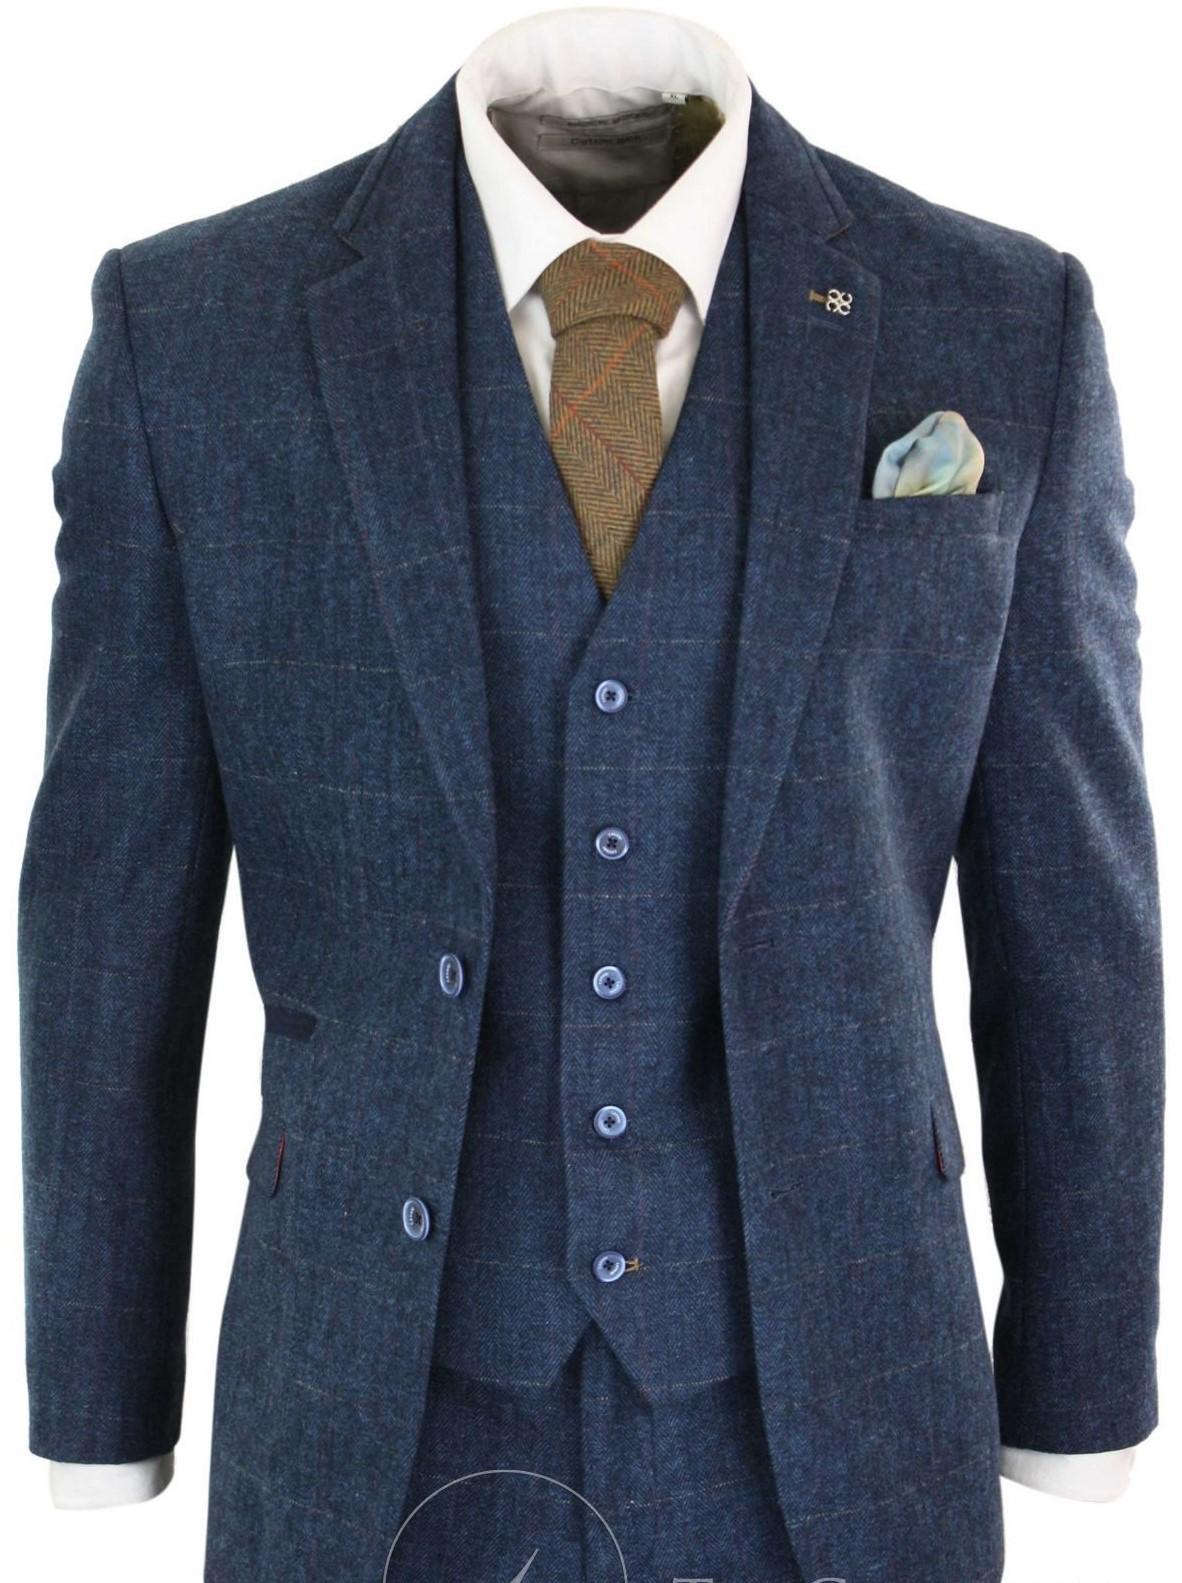 navy-blauw-driedelig-kostuum